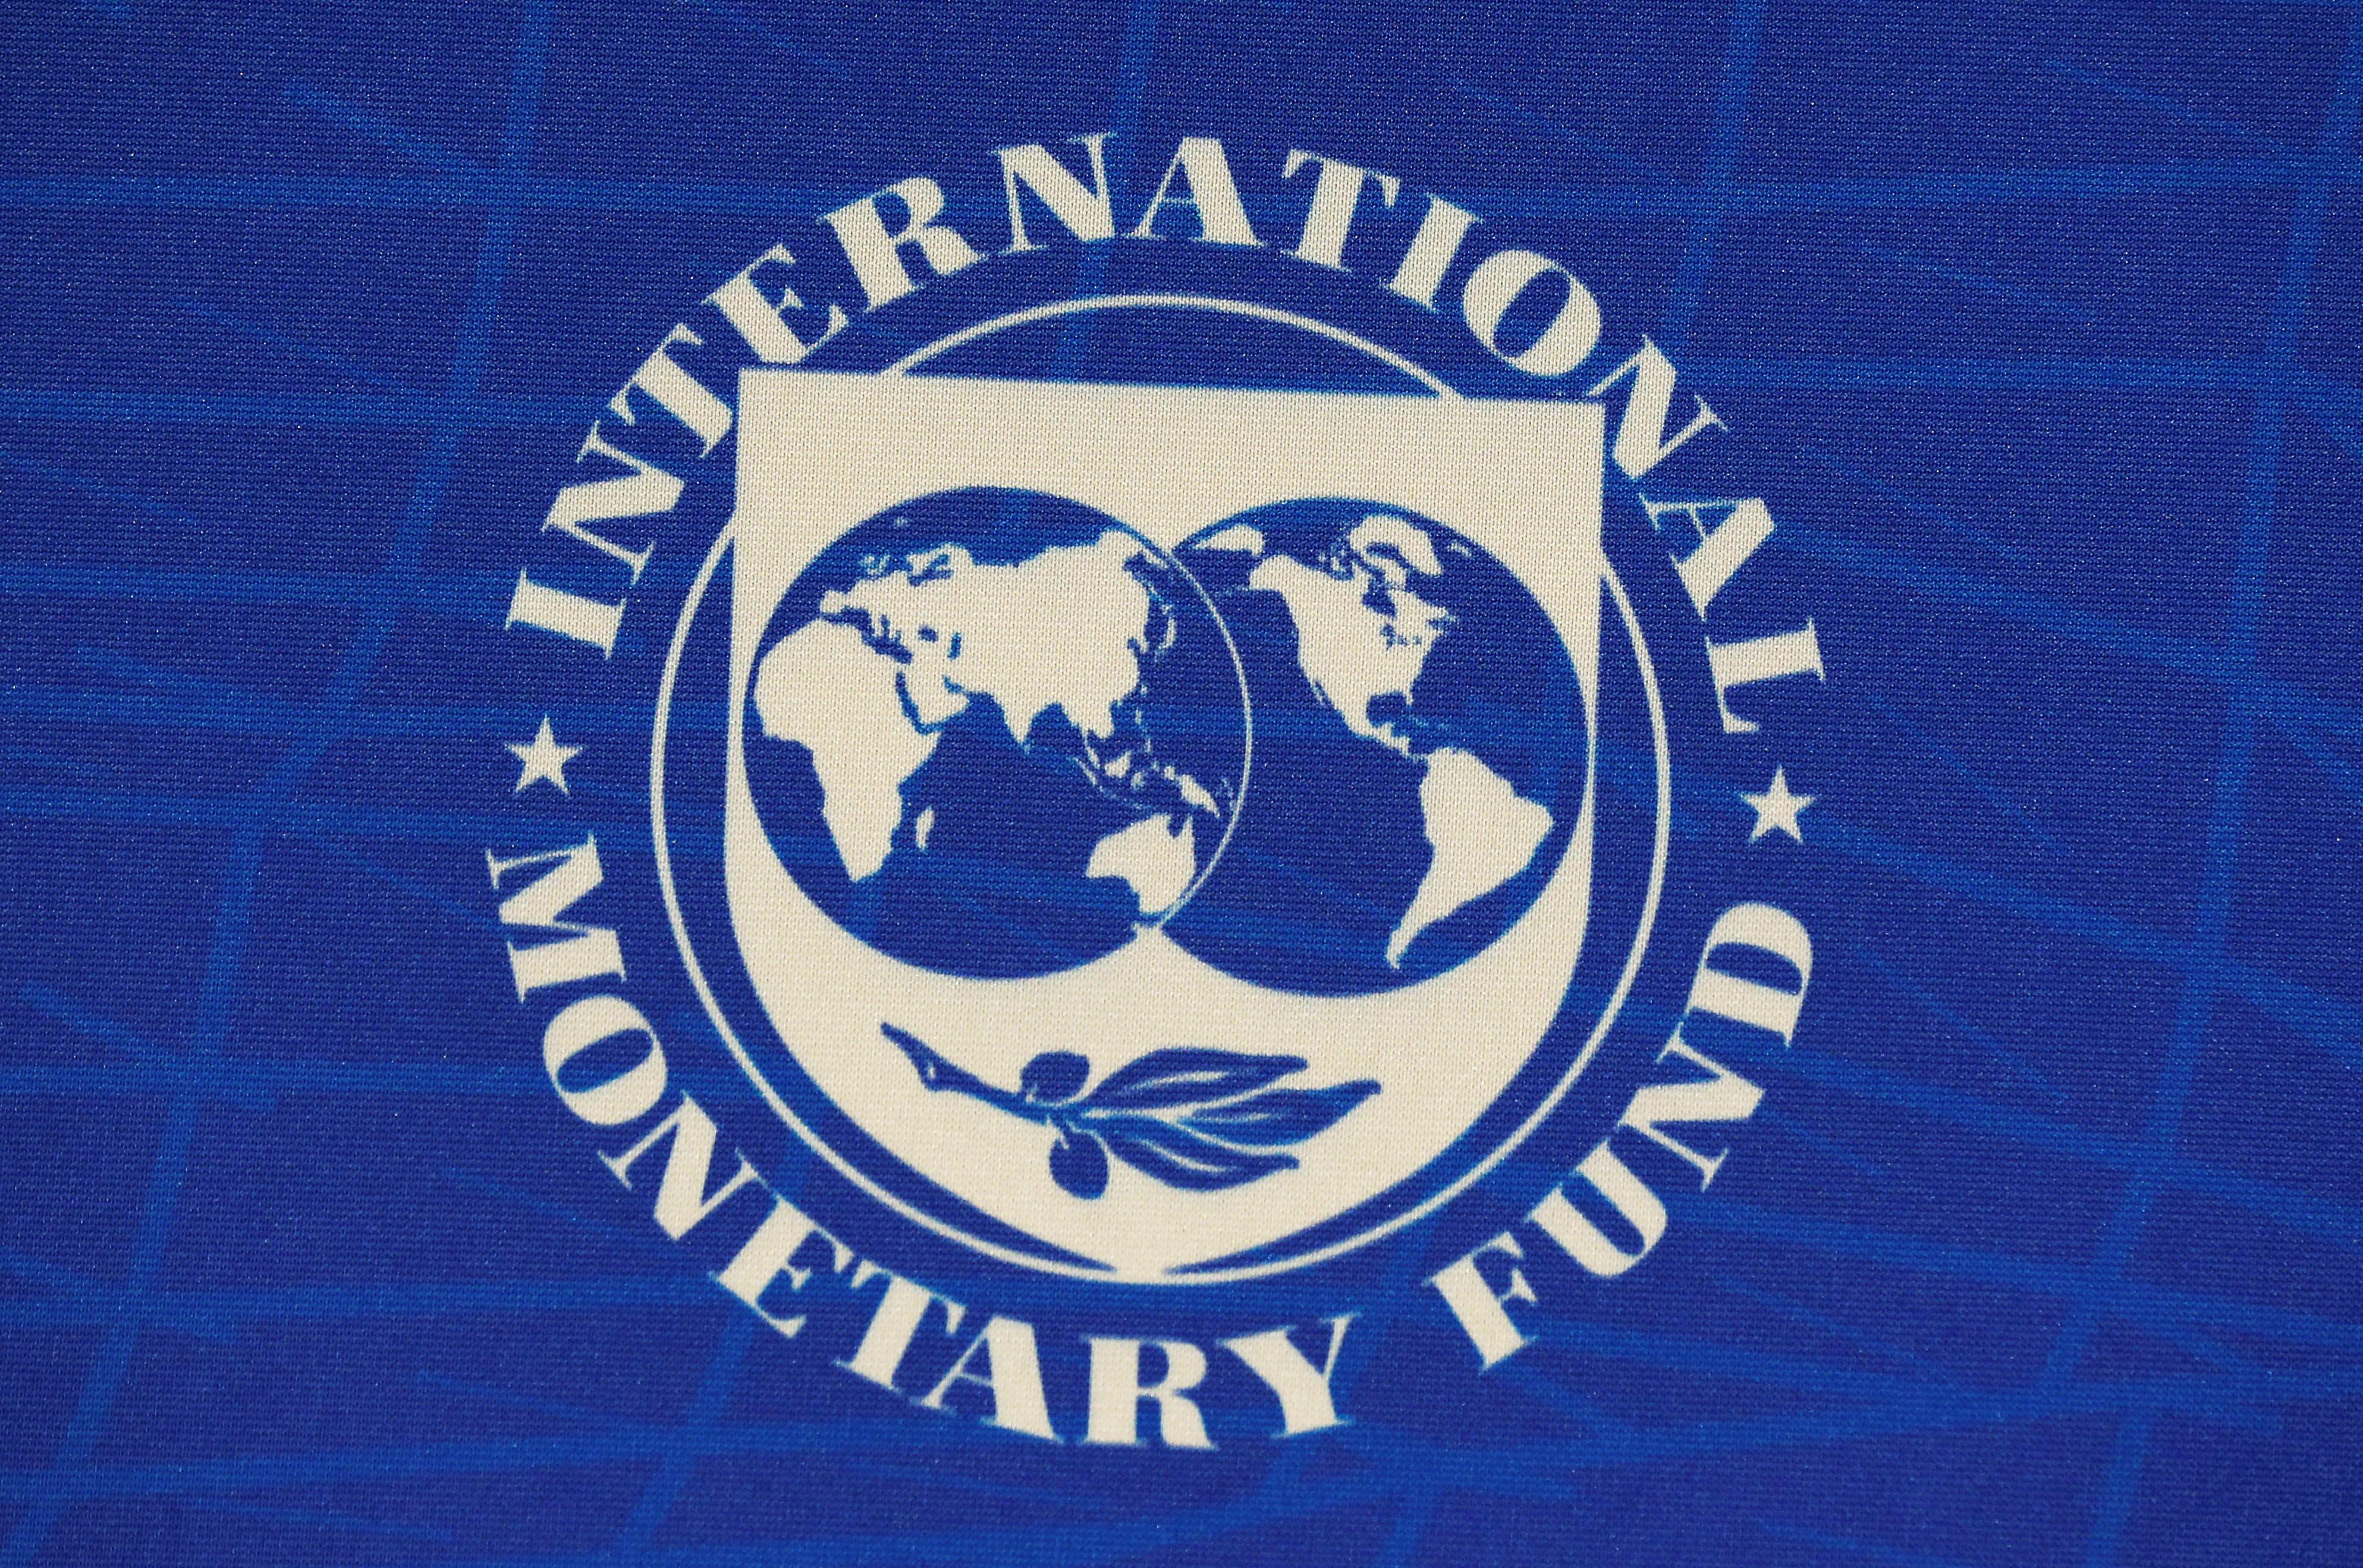 IMF says Egypt can draw final $2 billion from $12 billion loan programme